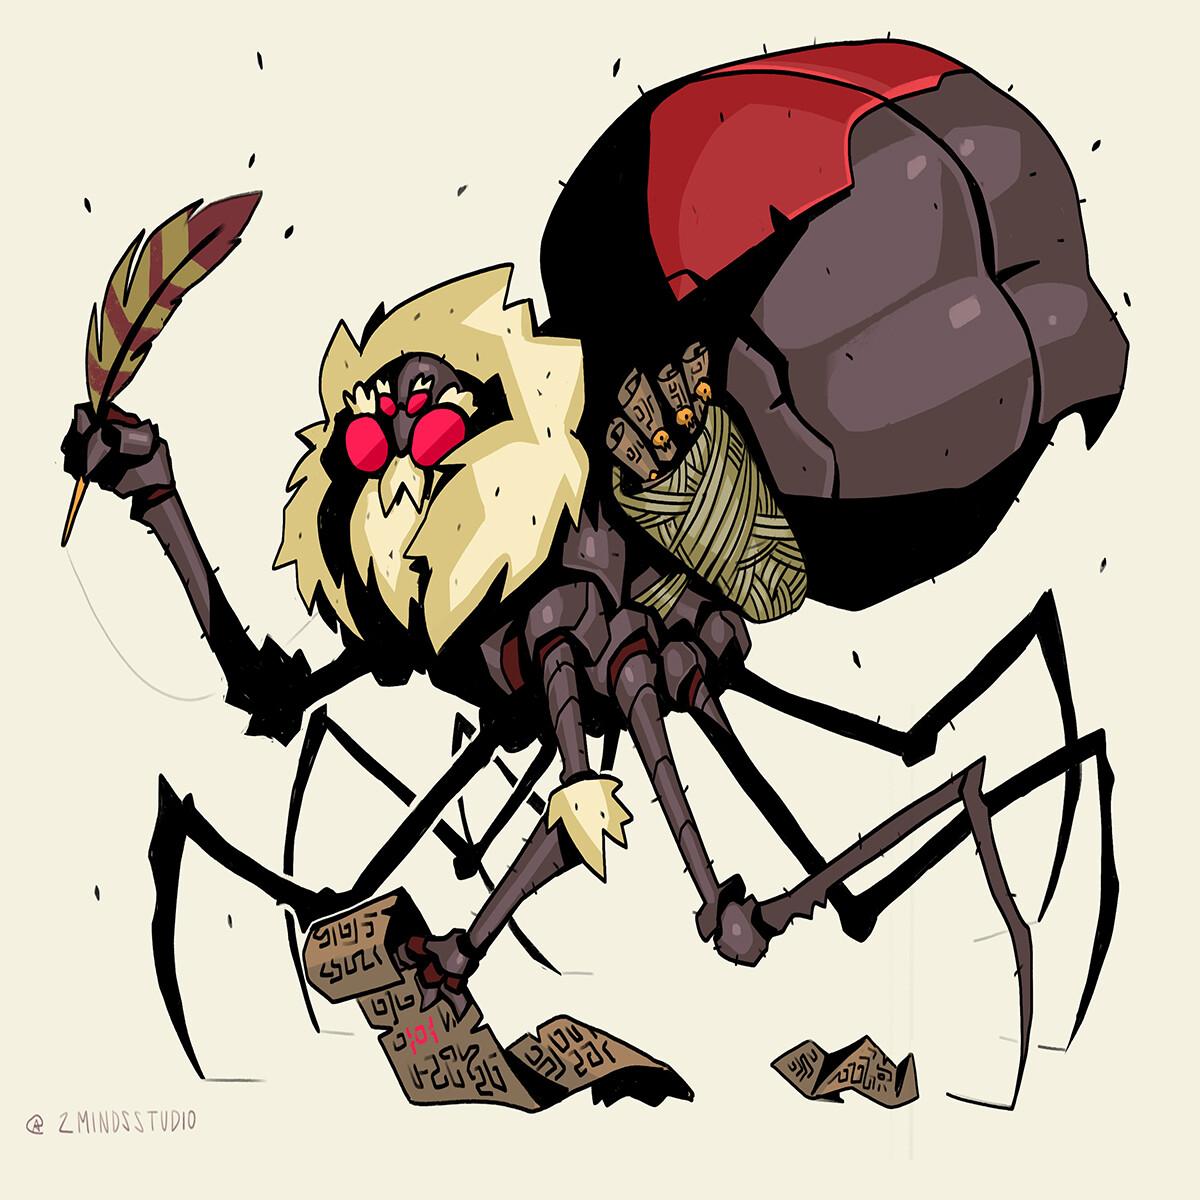 Spider Bibliotecary